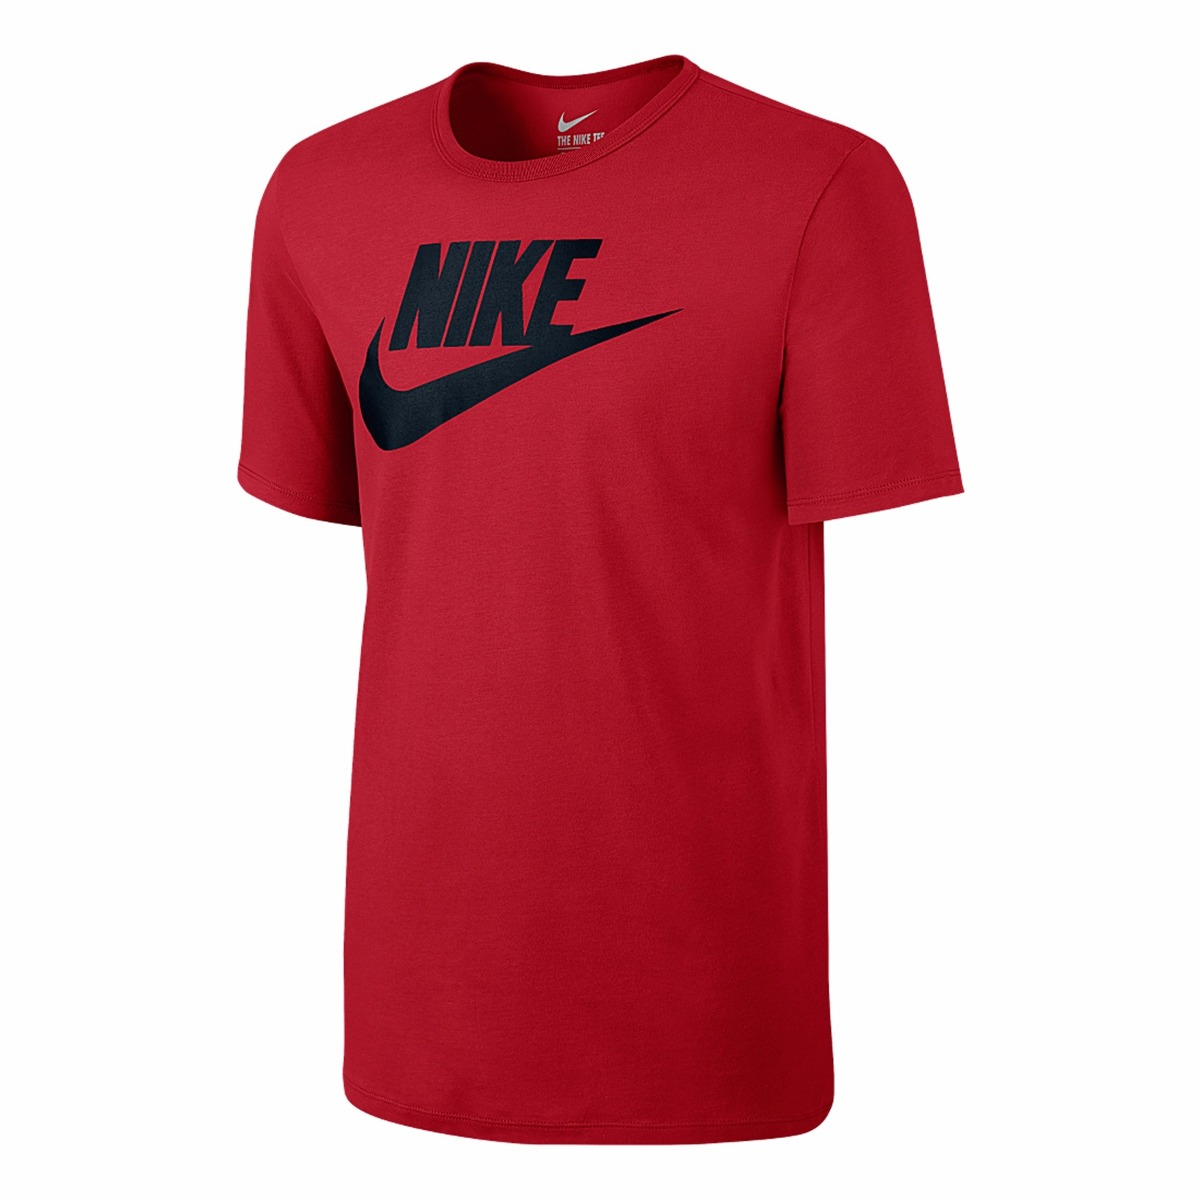 Camiseta Nike Manga Curta Tee - F696707